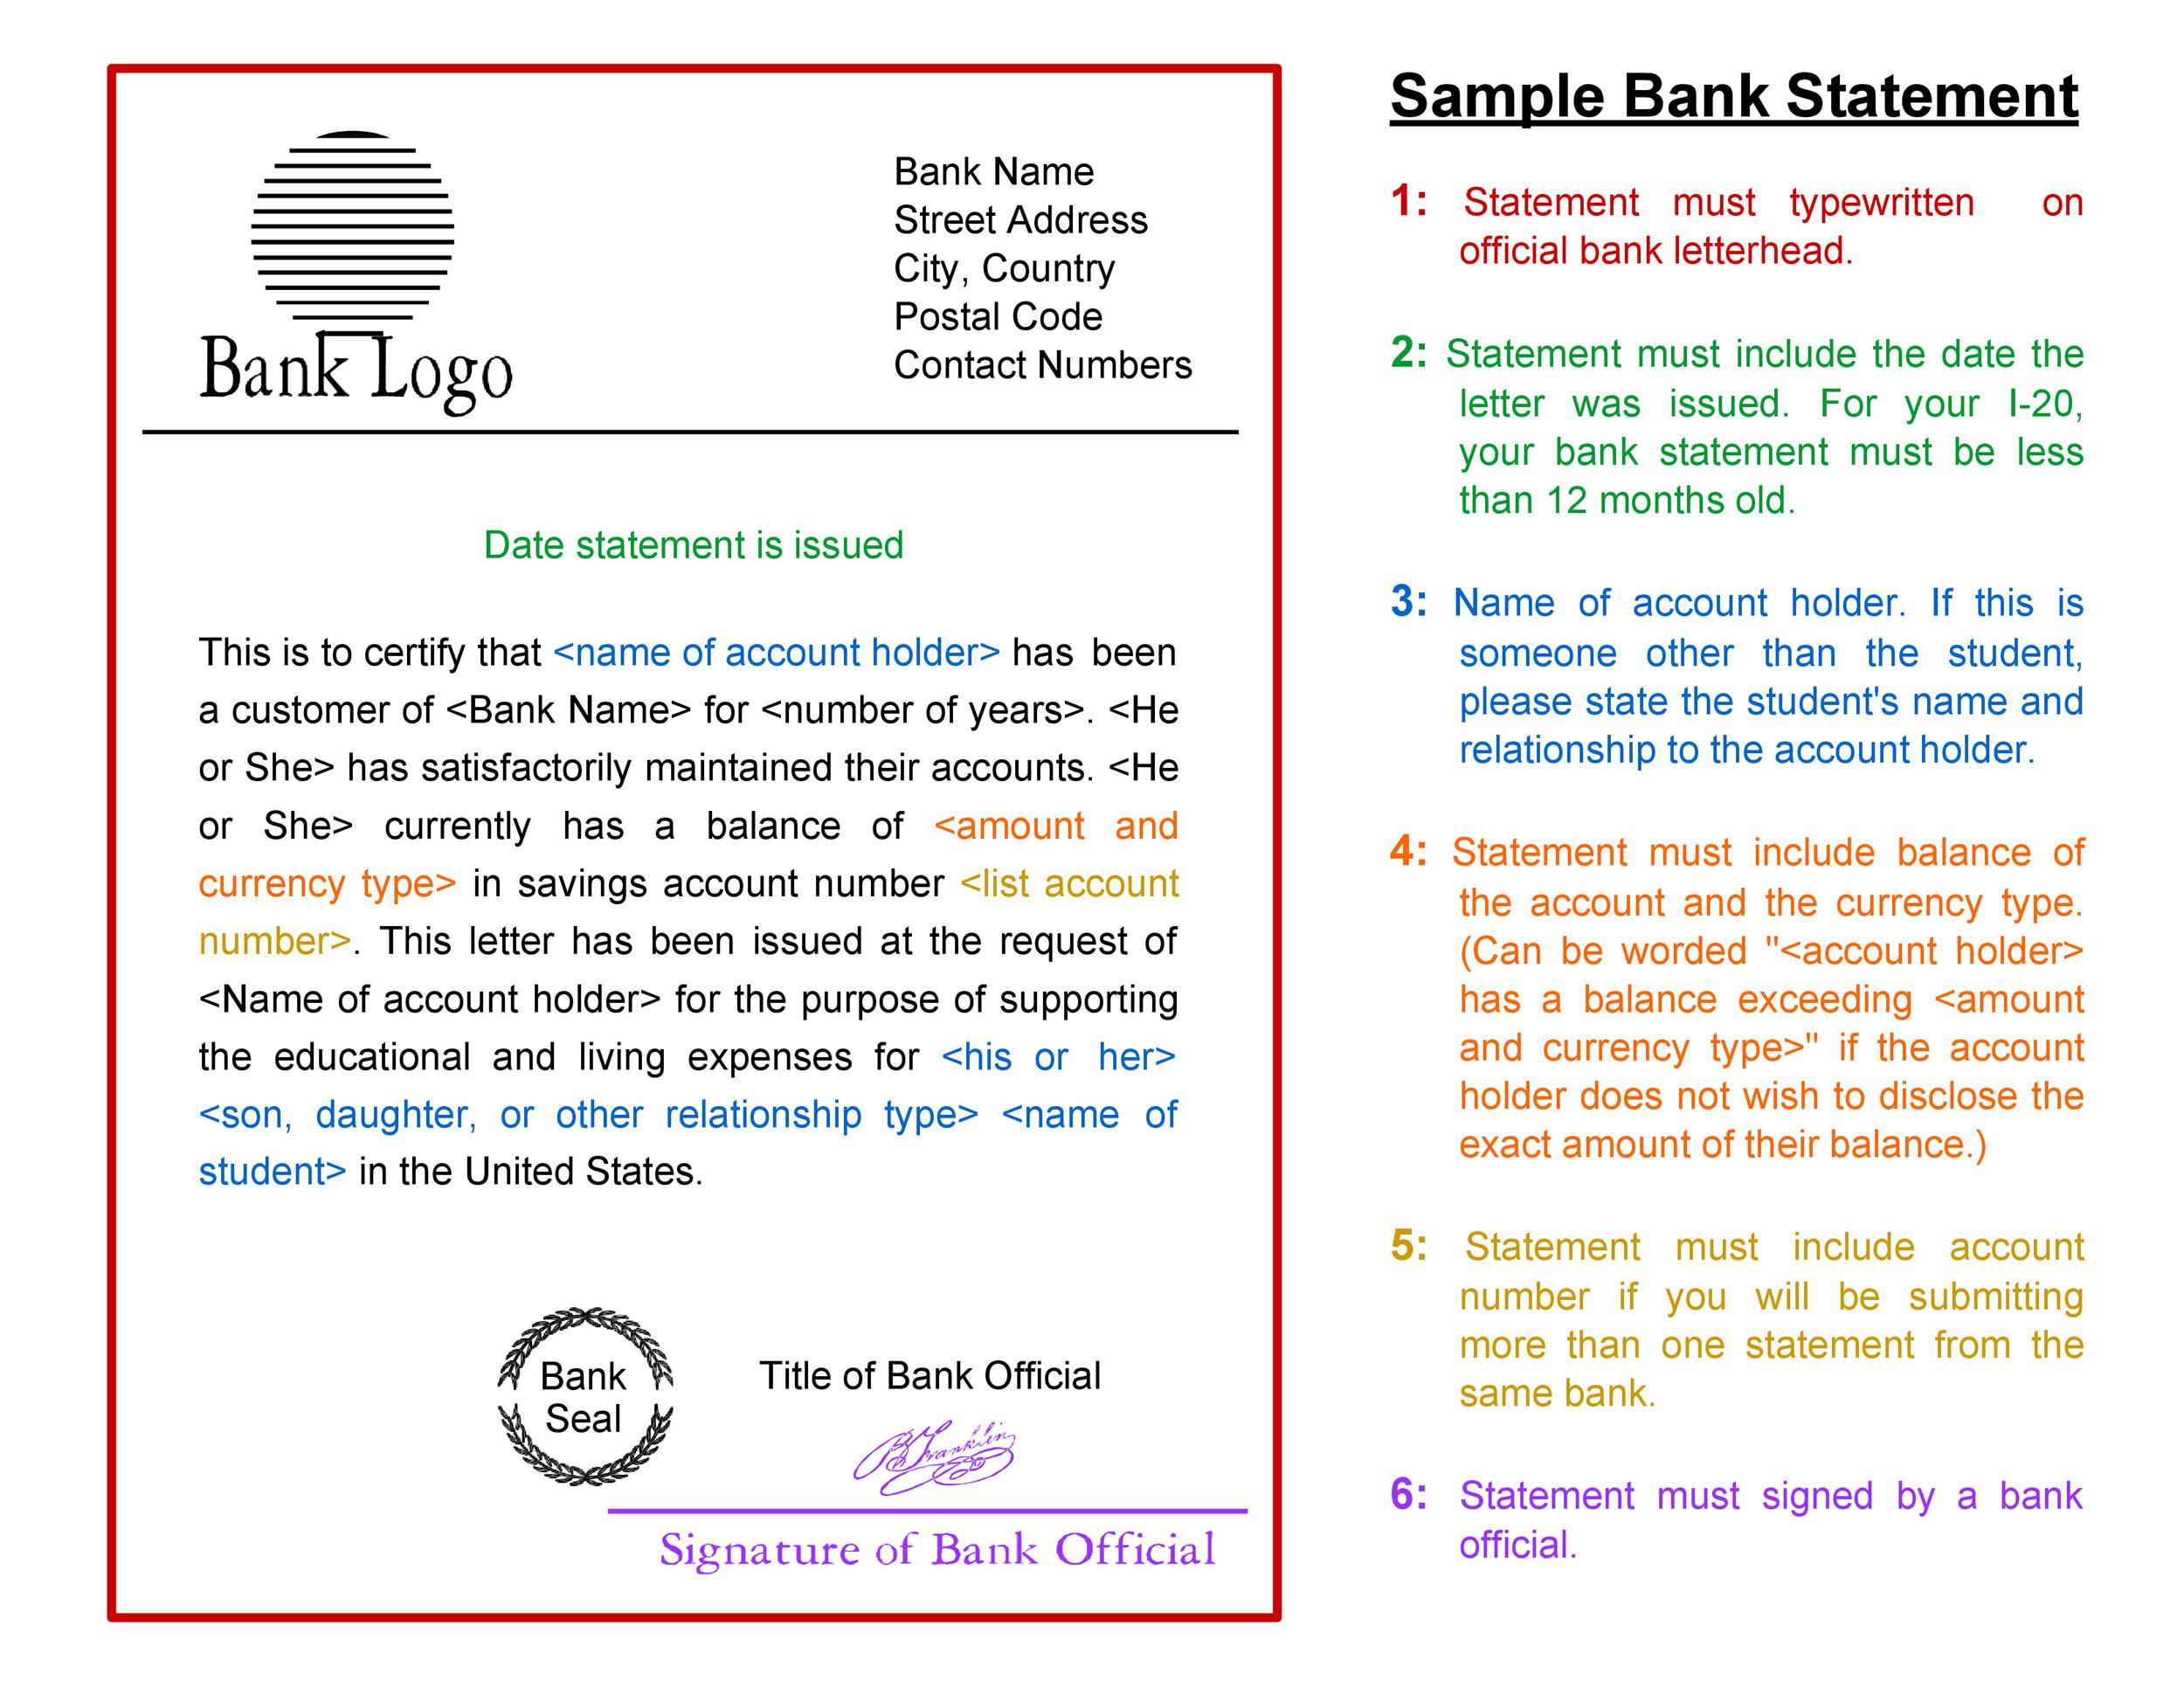 23 Editable Bank Statement Templates Free ᐅ Template Lab